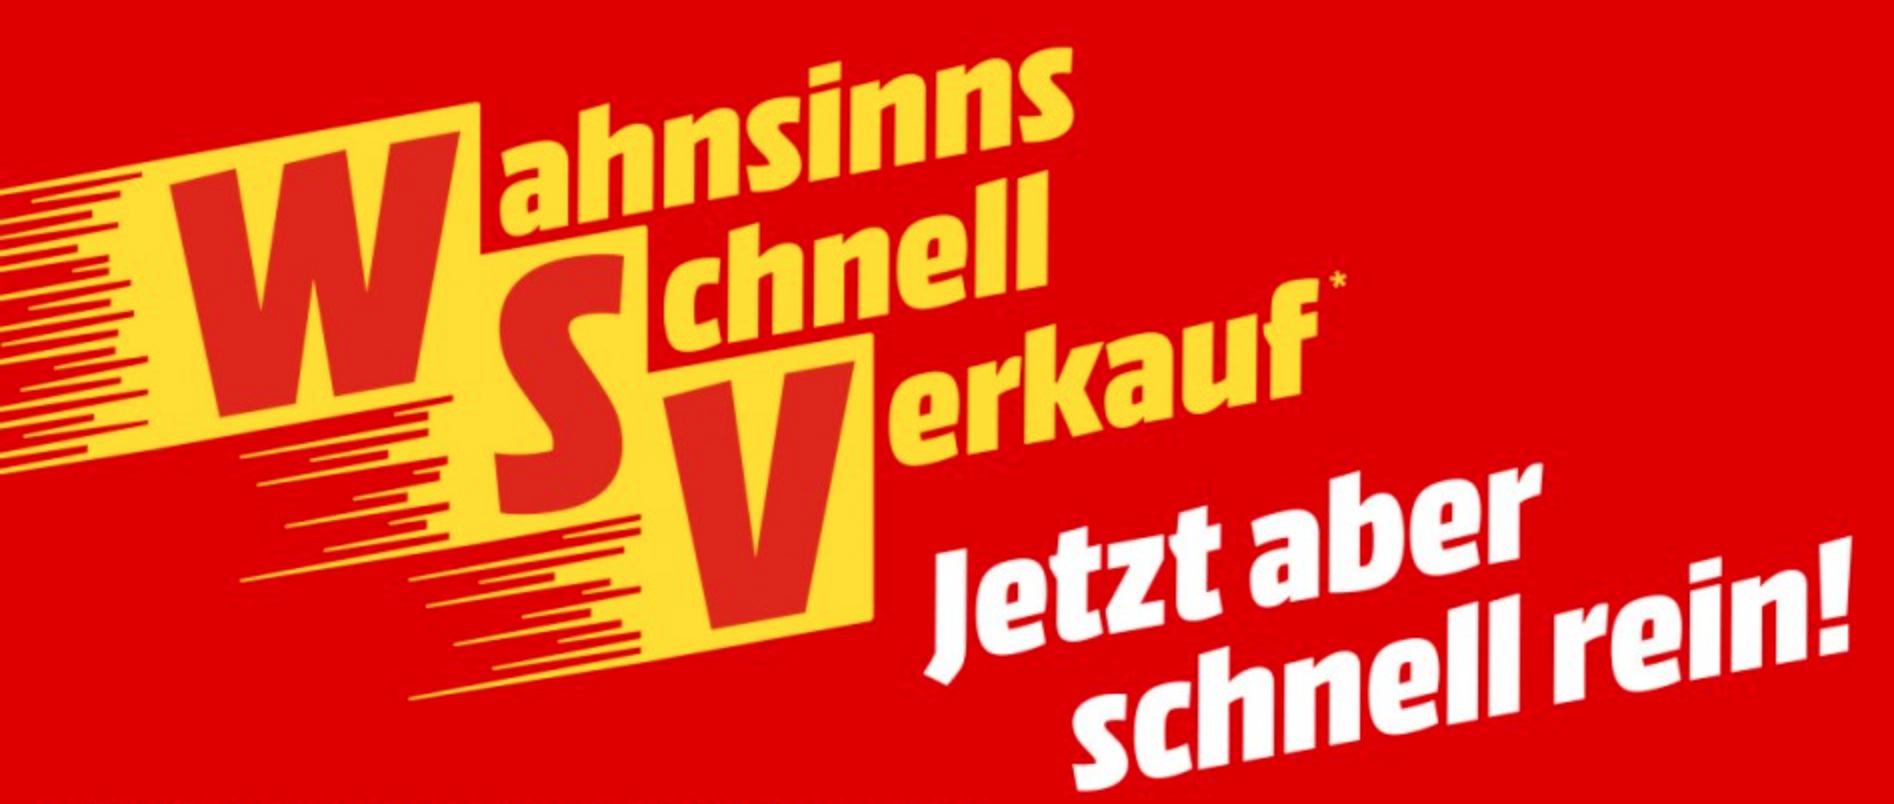 [MediaMarkt] WSV TV bis zu 300€ z.B. Philips 65 OLED 754 - 1485,43€ /Notebooks ab 499€ - 100€ Direktabzug /Kaffeevollautomat ab 399€ - 50€DA